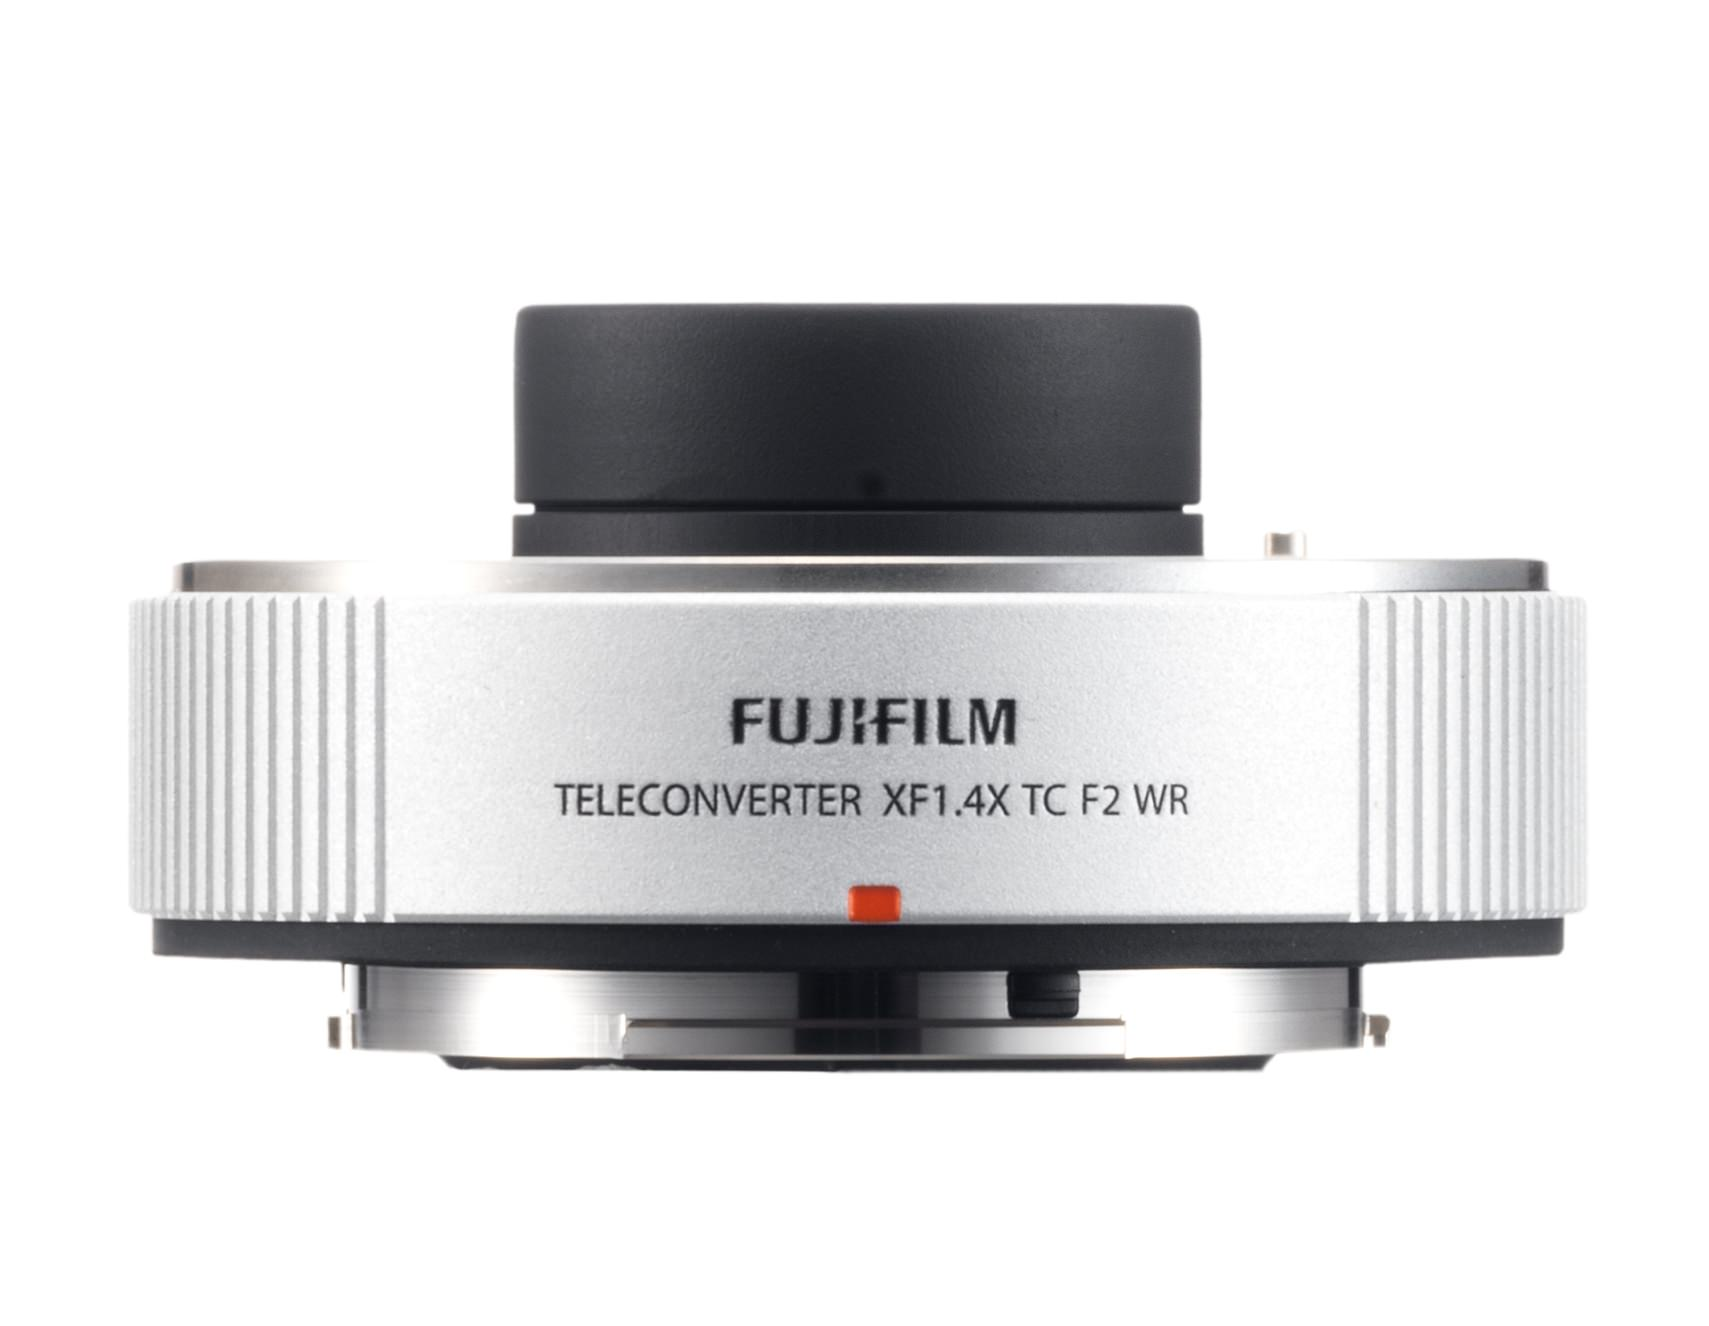 Nový telekonvertor XF1.4x TC F2 WR podporuje objektivy s clonou f/2